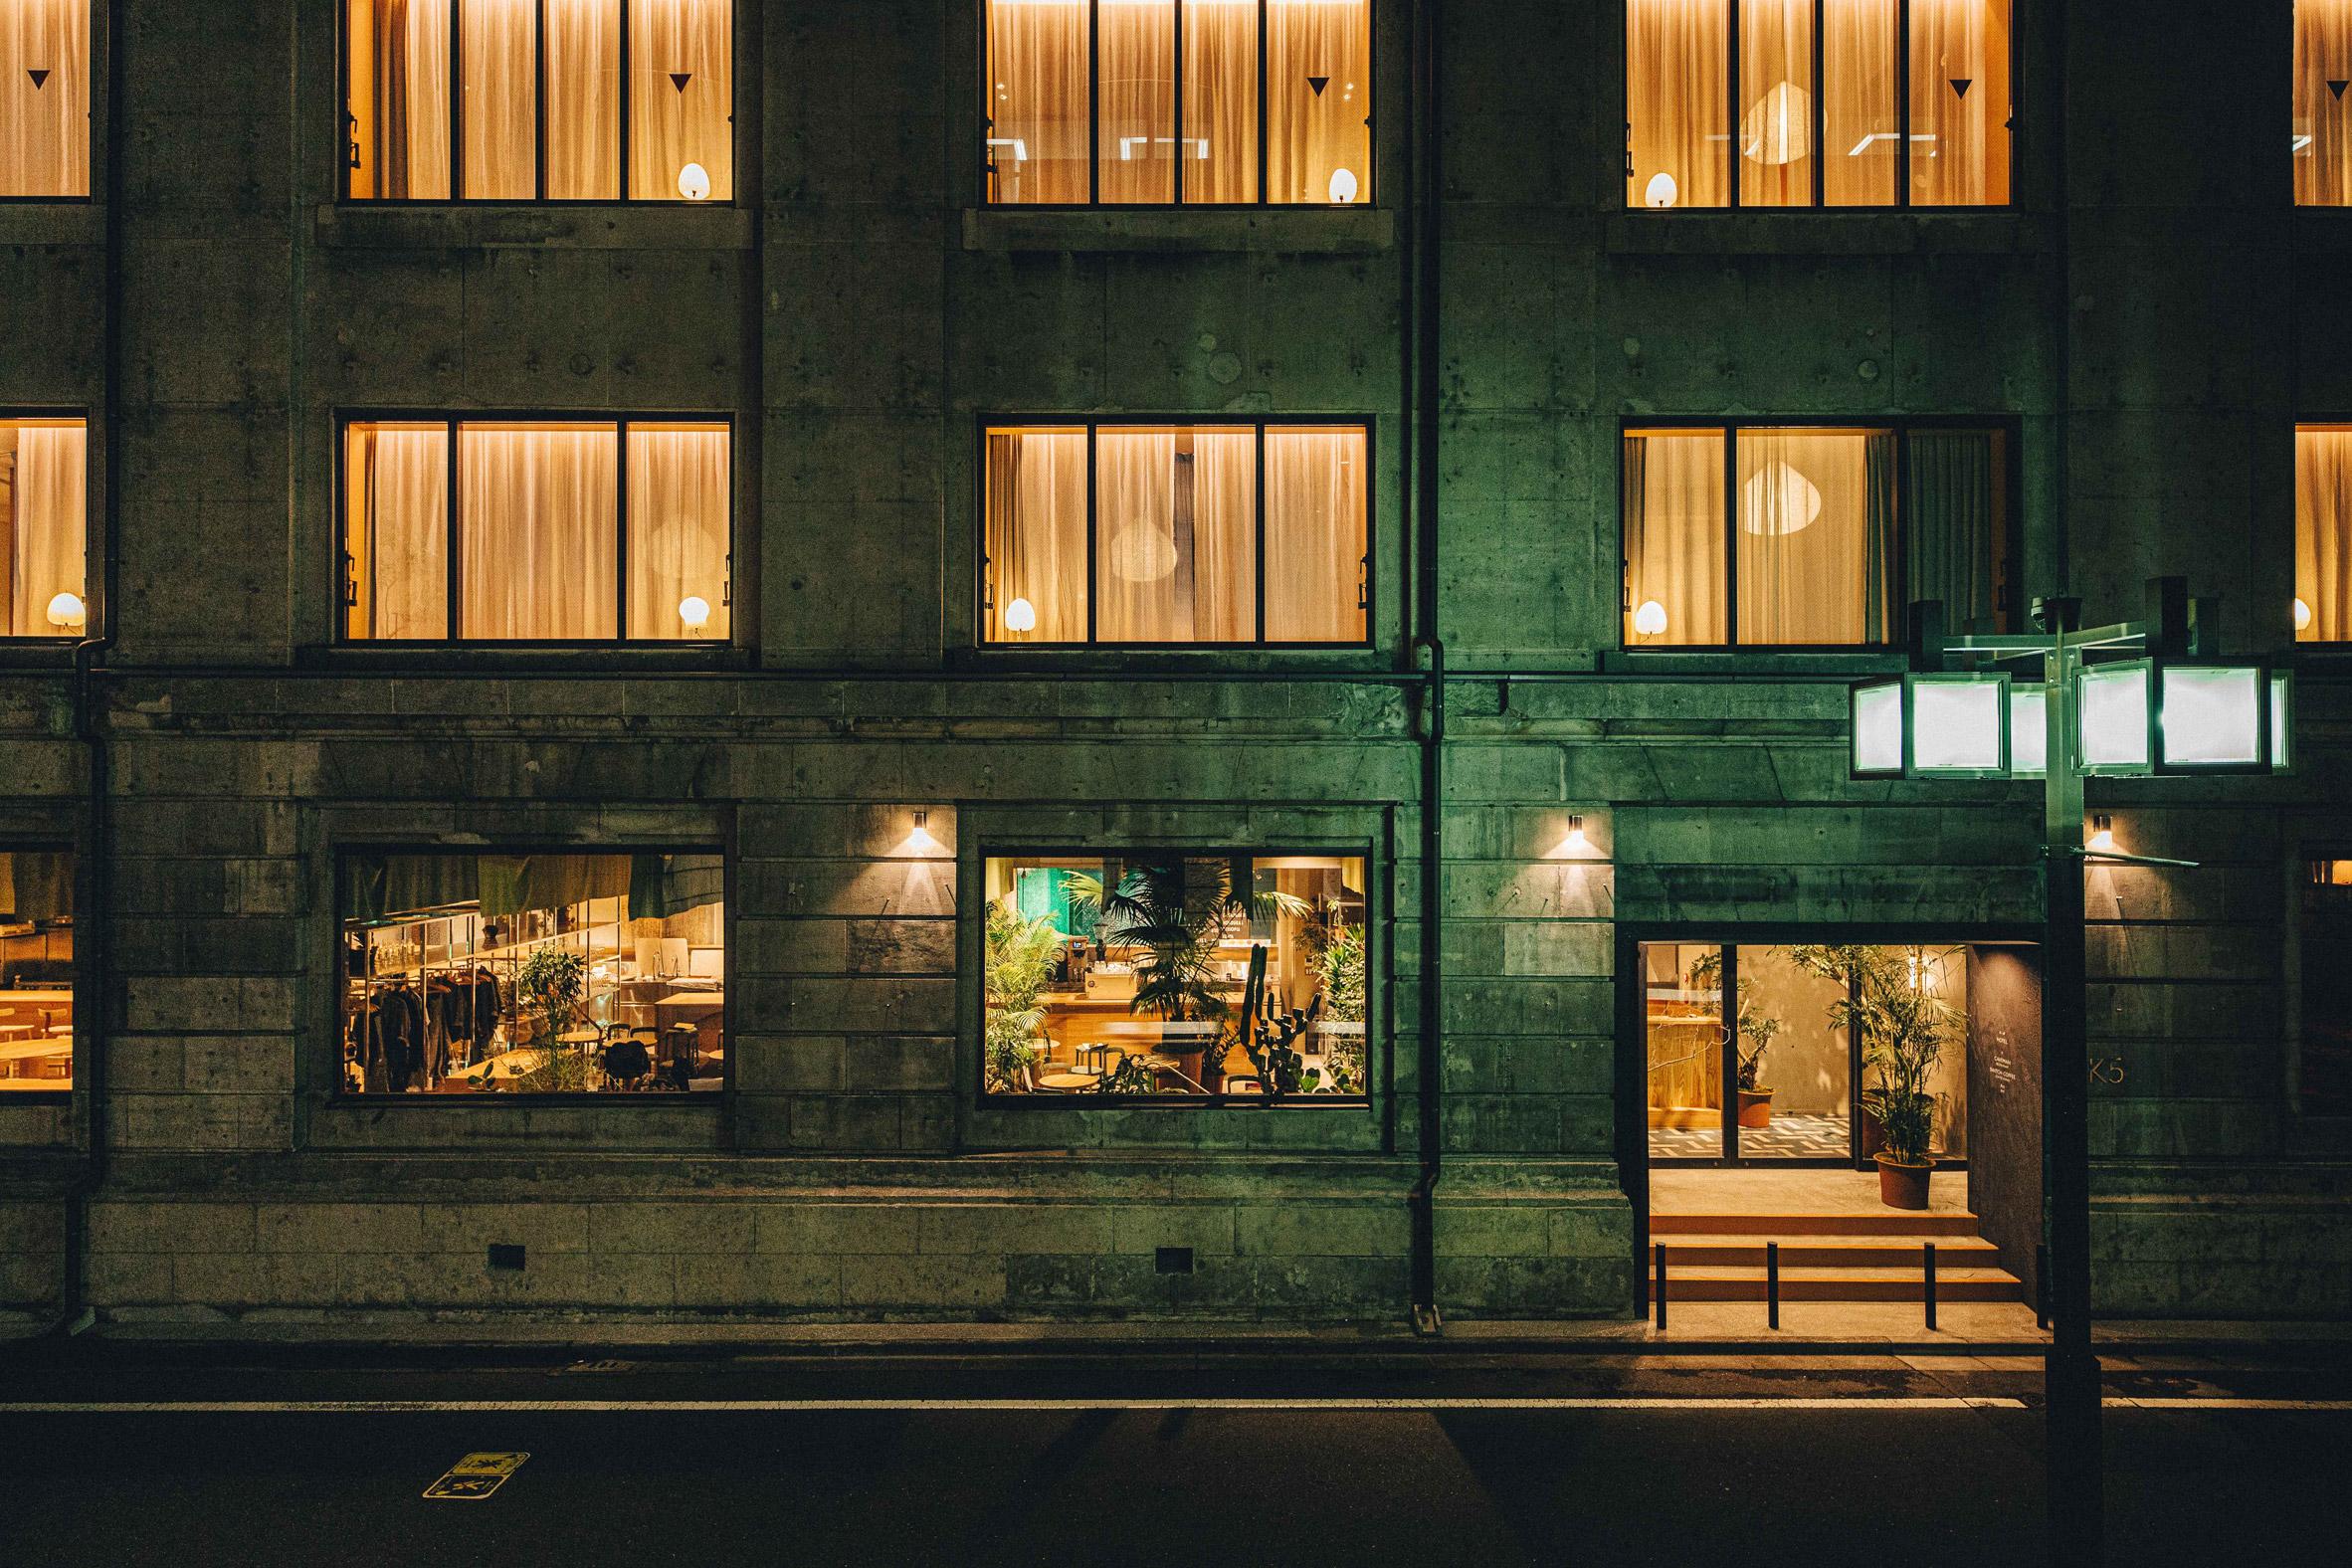 K5 Tokyo hotel by Claesson Koivisto Rune exterior